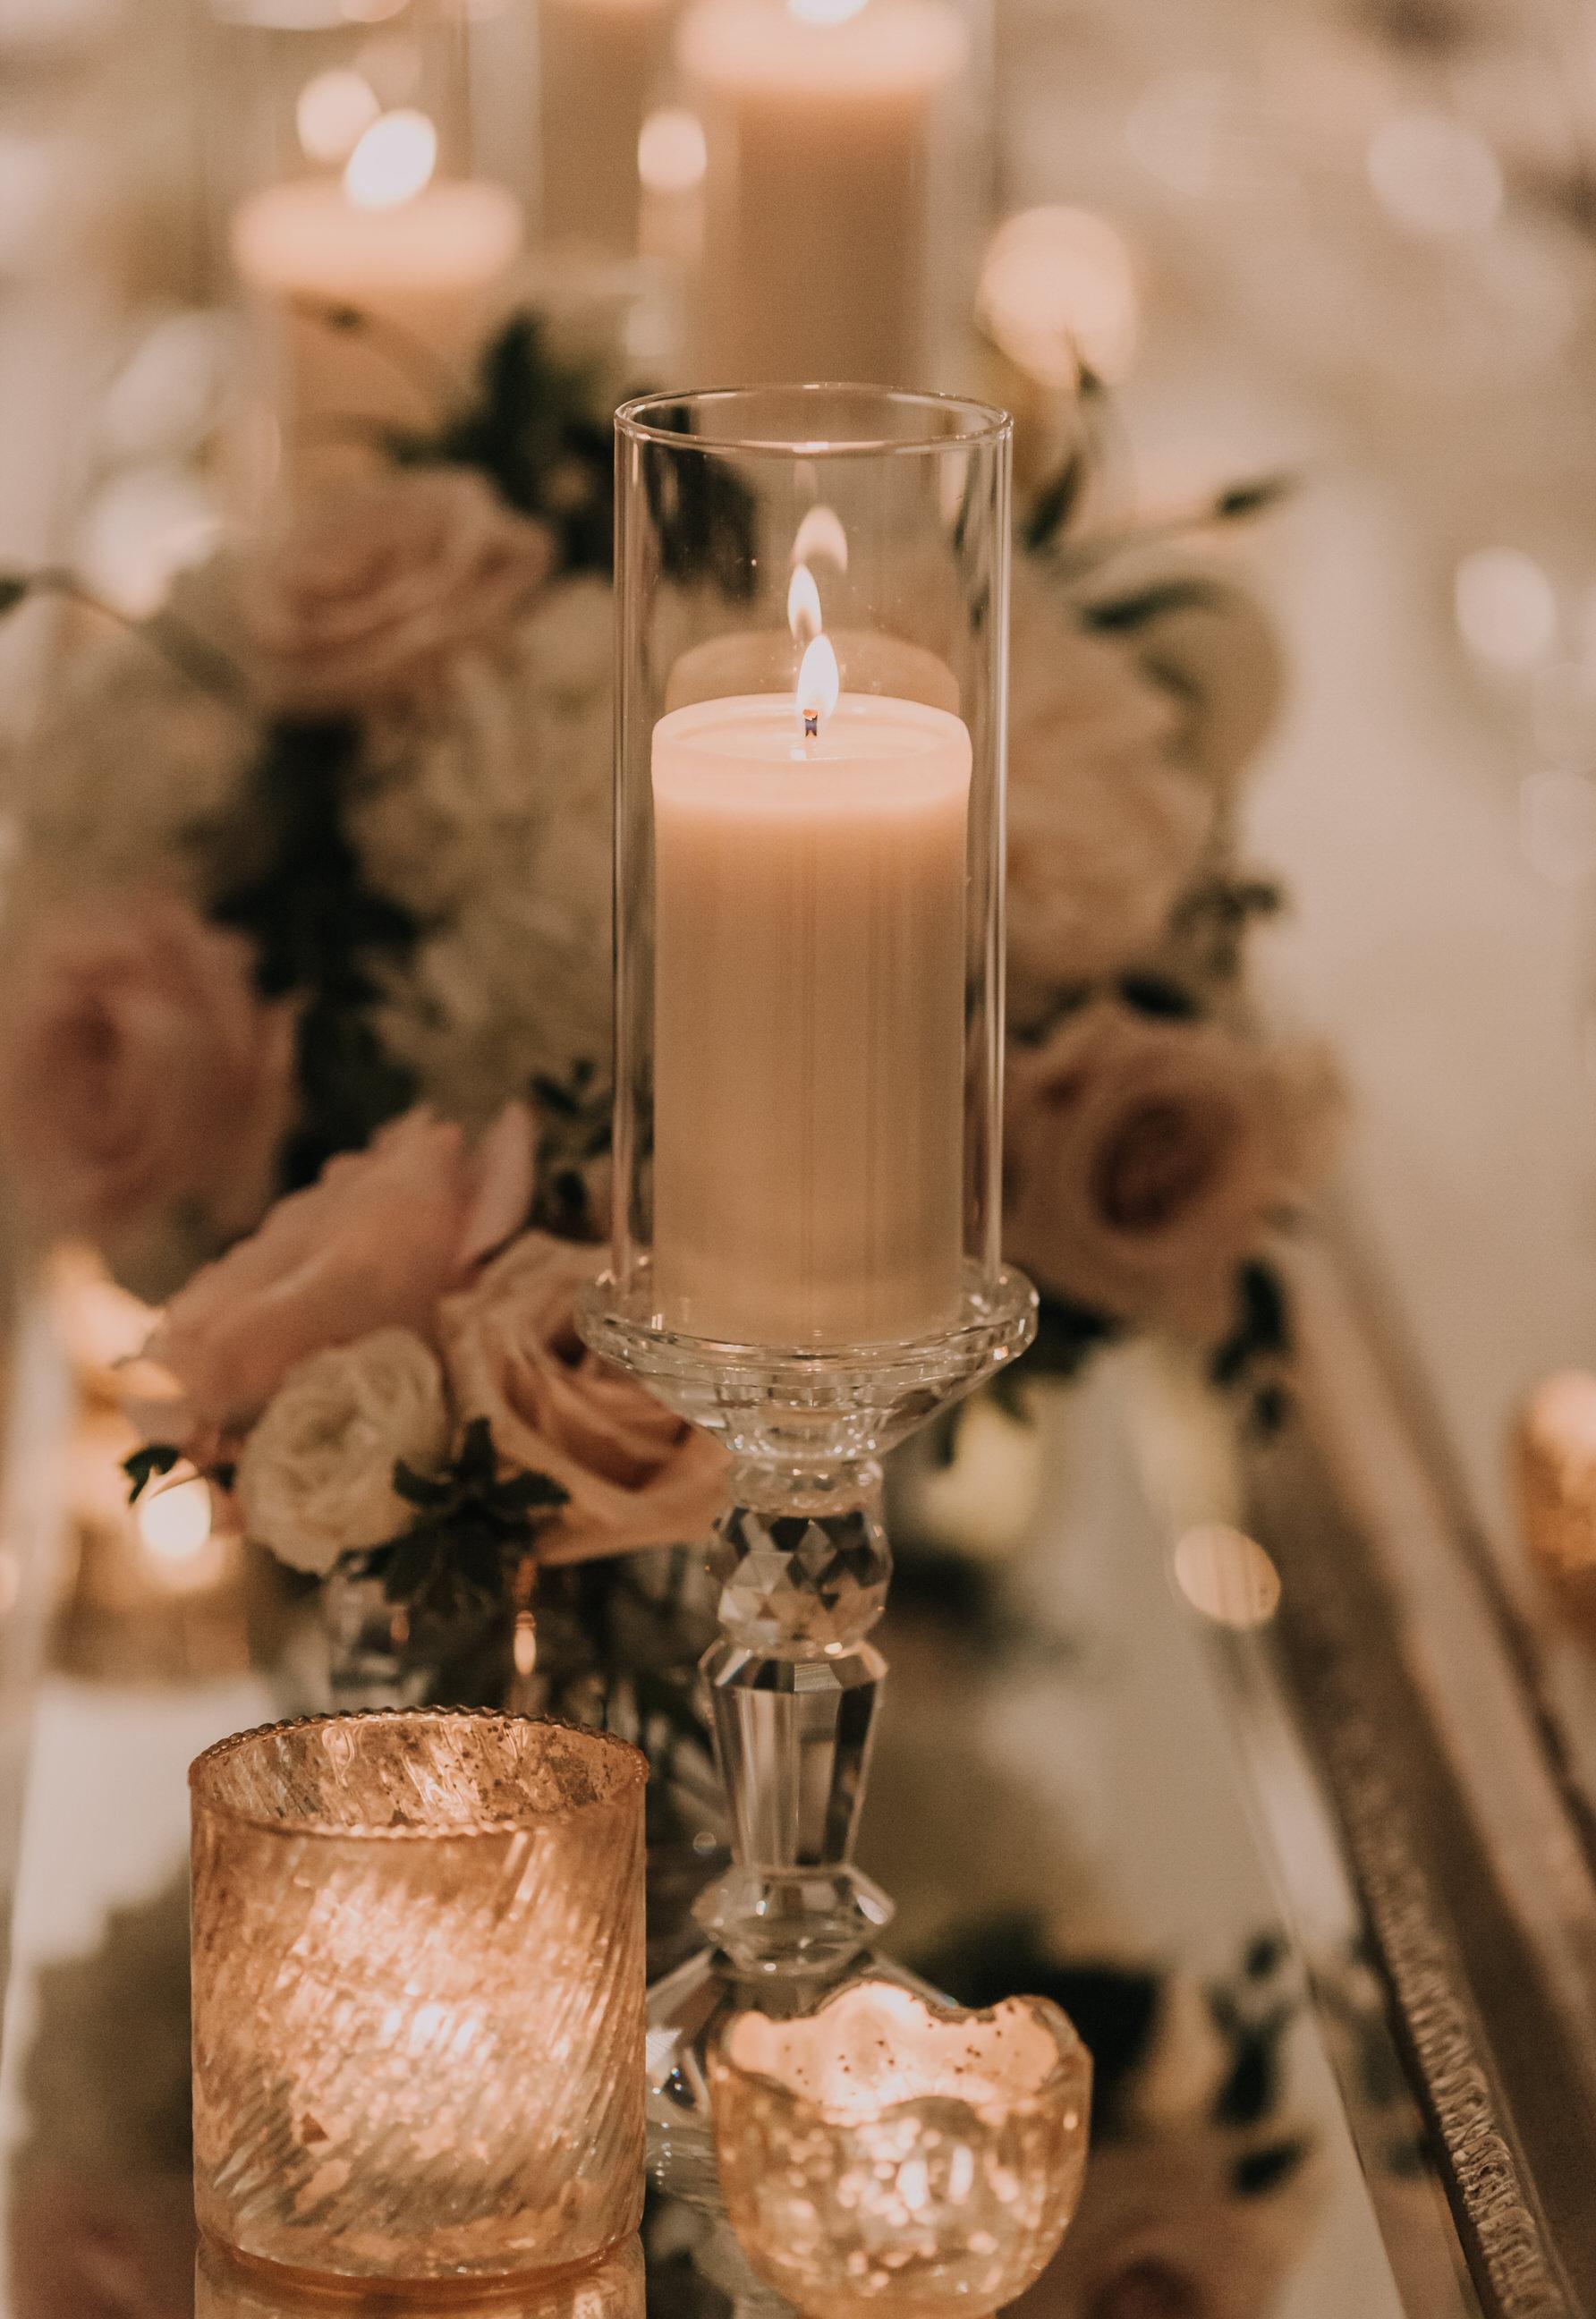 Pitt Meadows Wedding Photographer - Sky Hangar Wedding Photos - Vancouver Wedding Photographer & Videographer - Sunshine Coast Wedding Photos - Sunshine Coast Wedding Photographer - Jennifer Picard Photography - IMG_6187.jpg